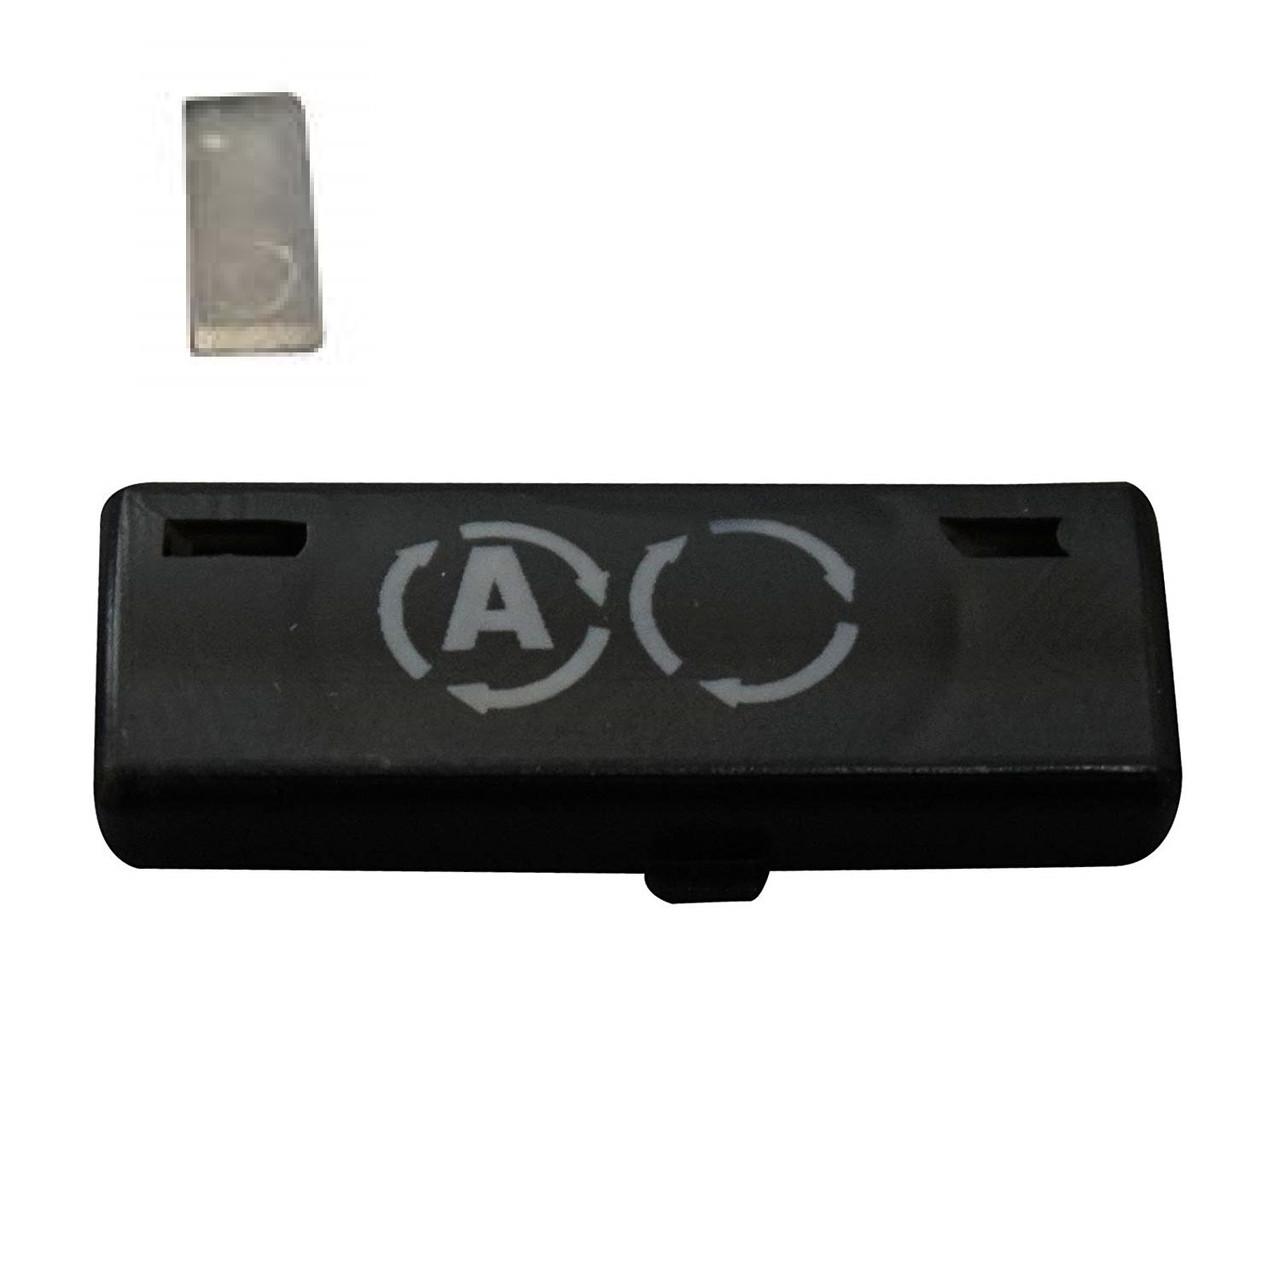 Клавиша кнопка климат контроля BMW 5 E39 64118375645 64116915812 бмв 5 е39 кнопка рециркуляция воздуха